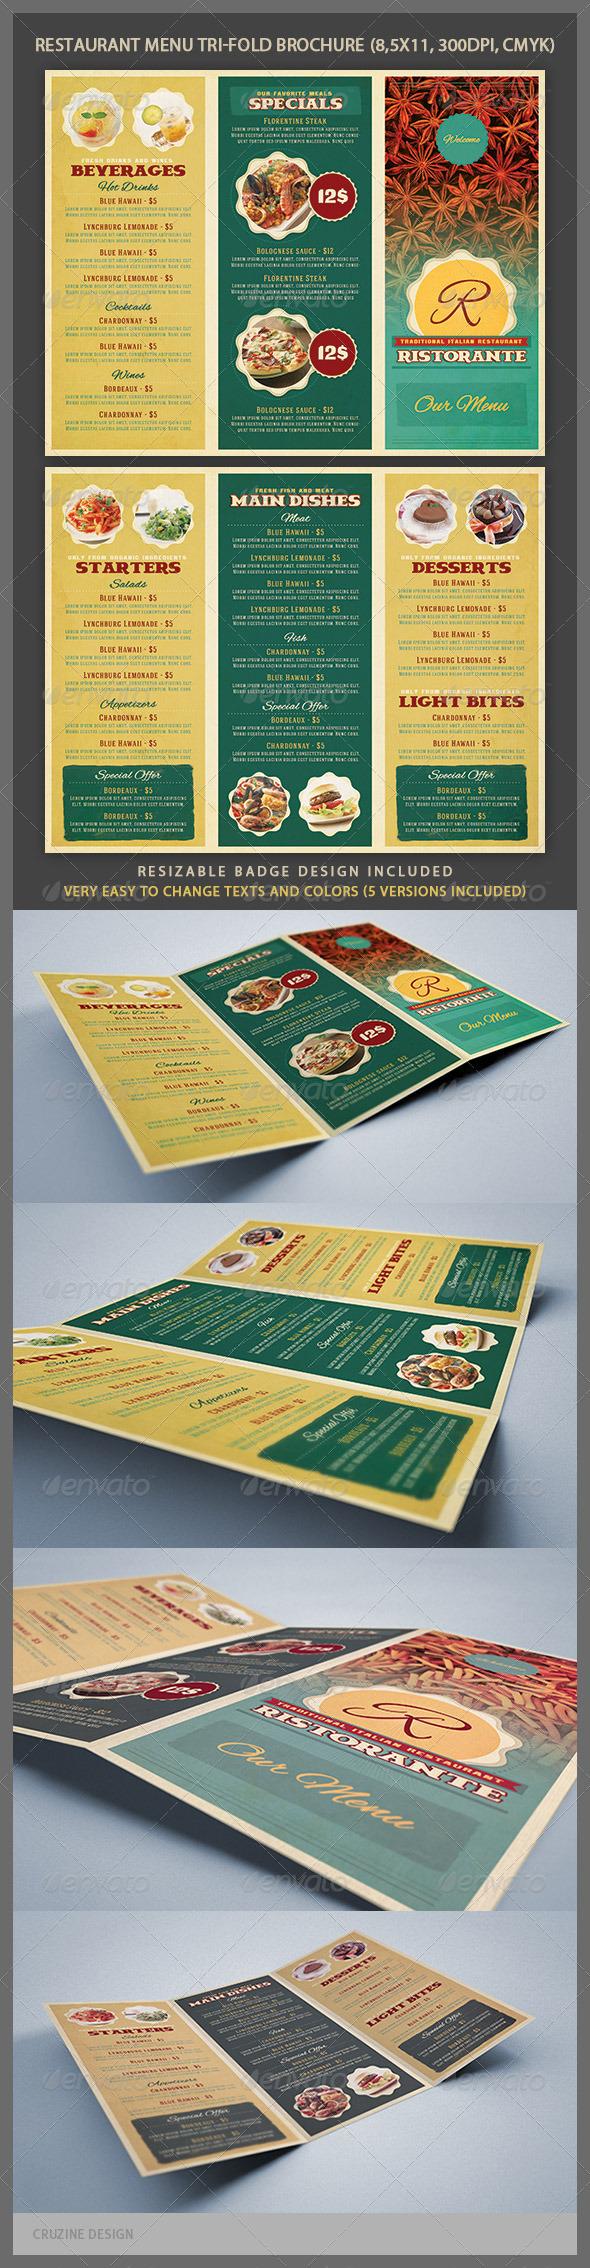 Restaurant Menu Tri-fold Brochure - Brochures Print Templates